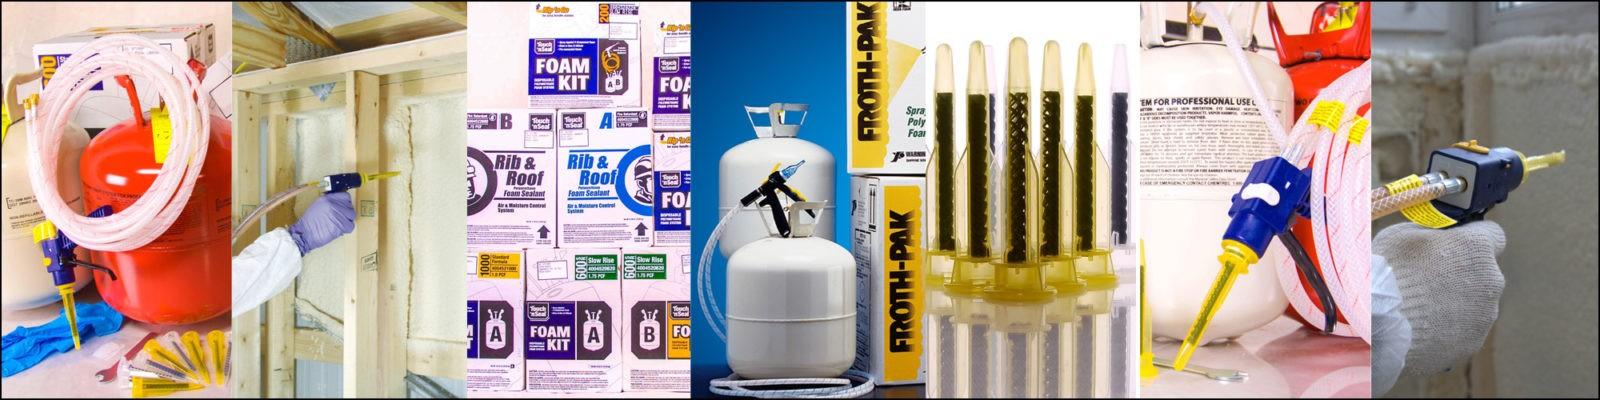 Foamkit 200 600 1000 300 sr ппу ручного нанесение напыление своими руками пенополиуретан foam Kit